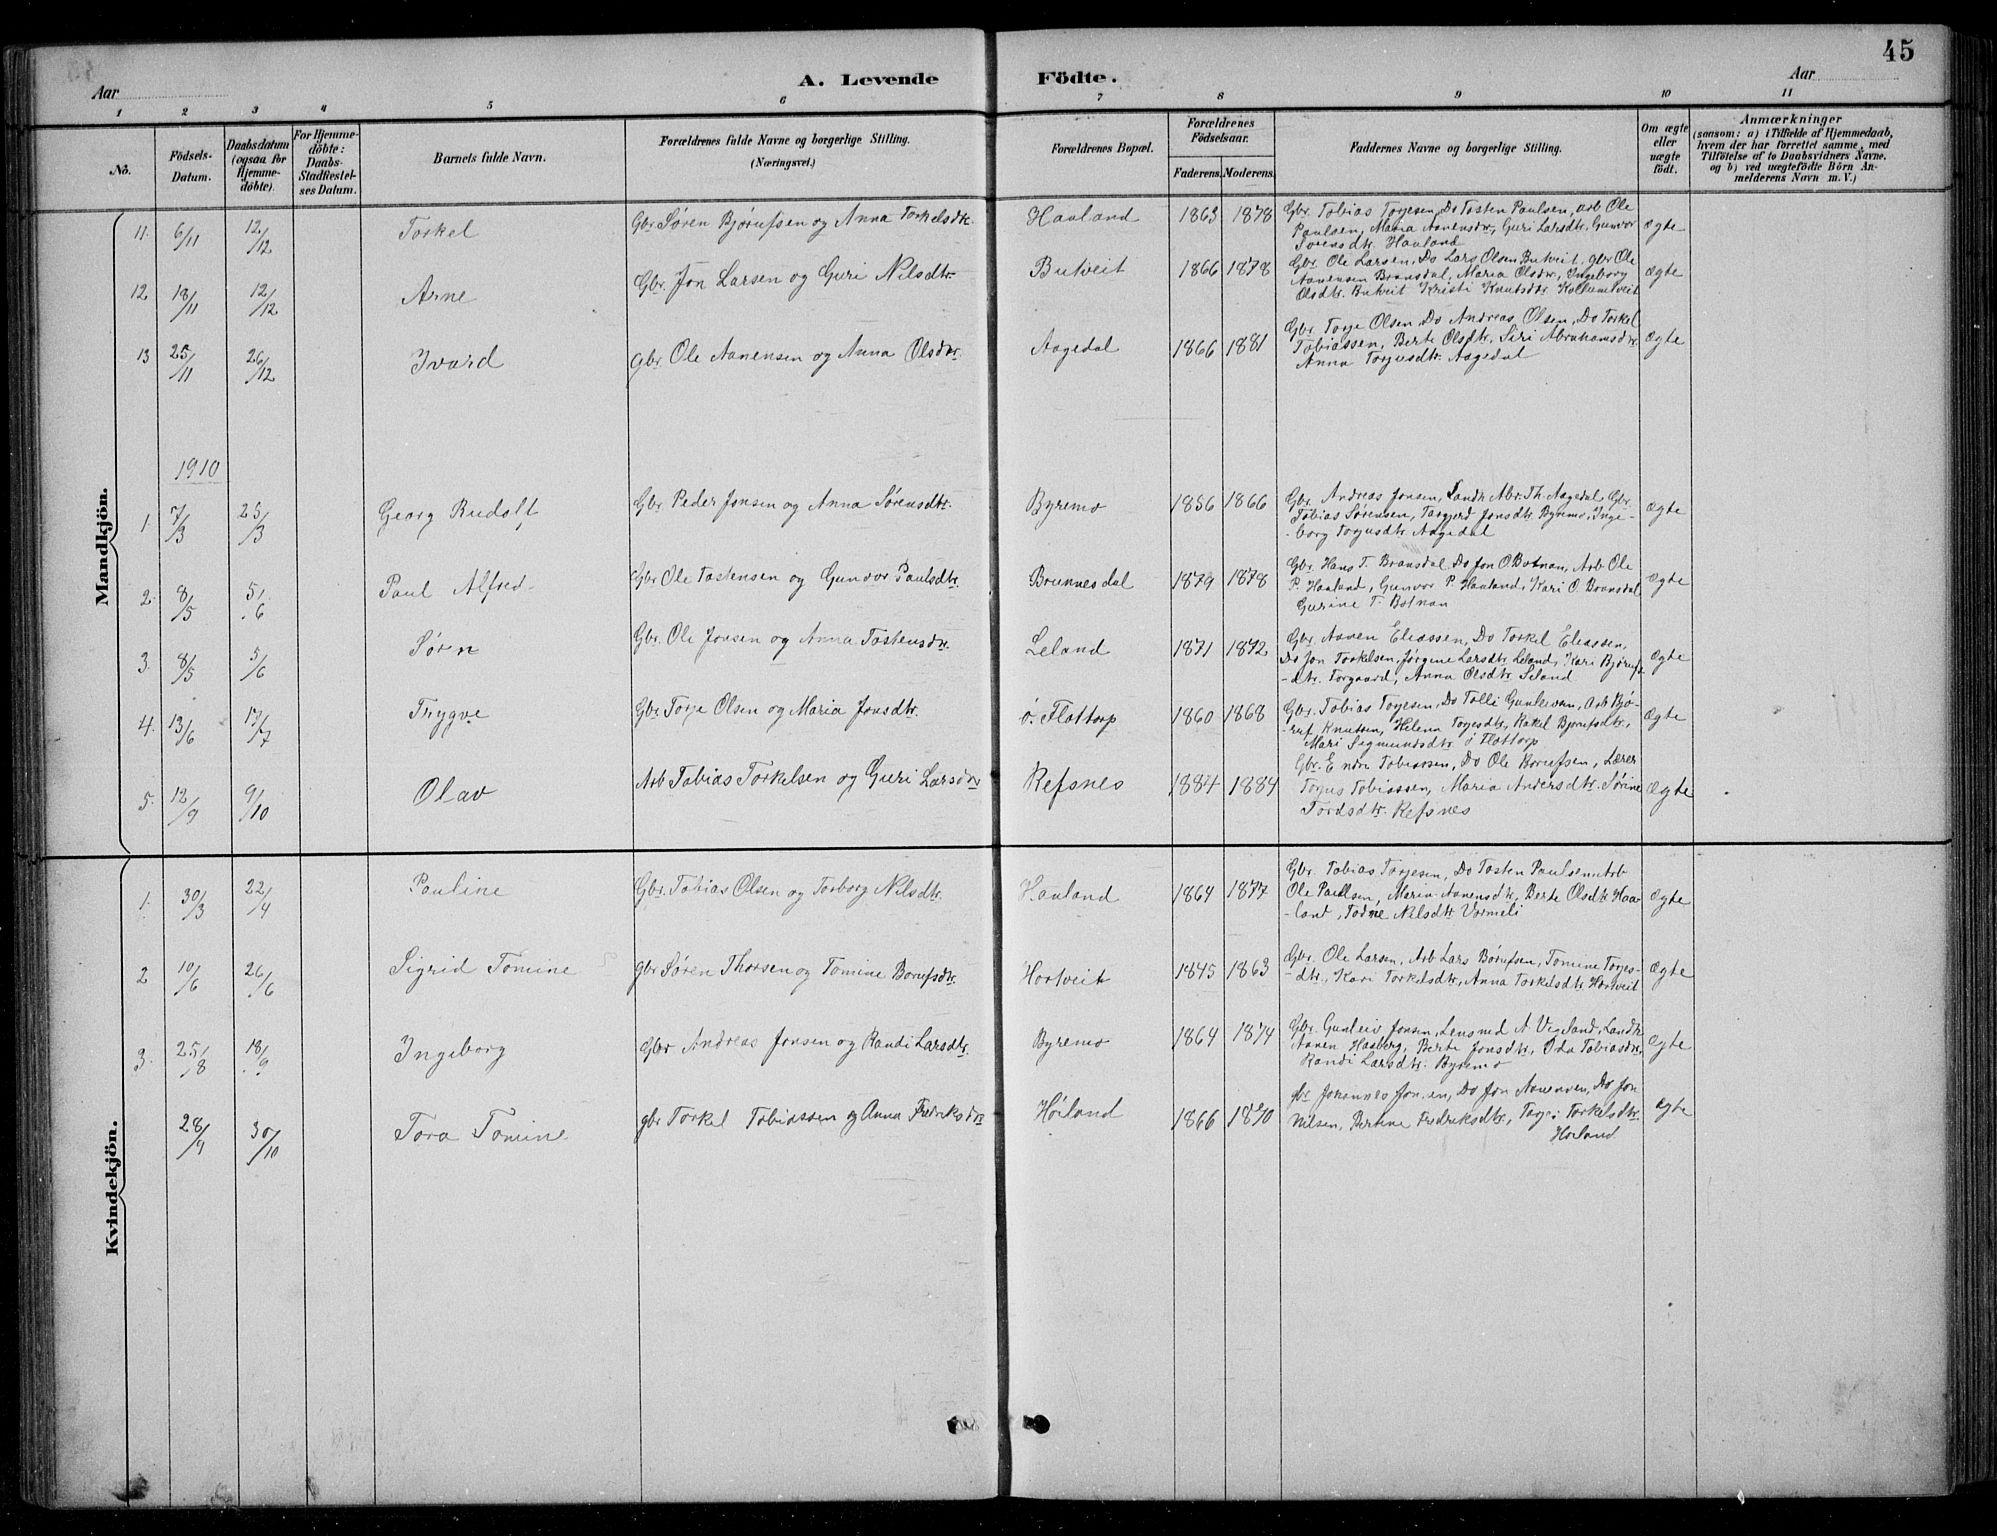 SAK, Bjelland sokneprestkontor, F/Fb/Fbc/L0003: Klokkerbok nr. B 3, 1887-1924, s. 45